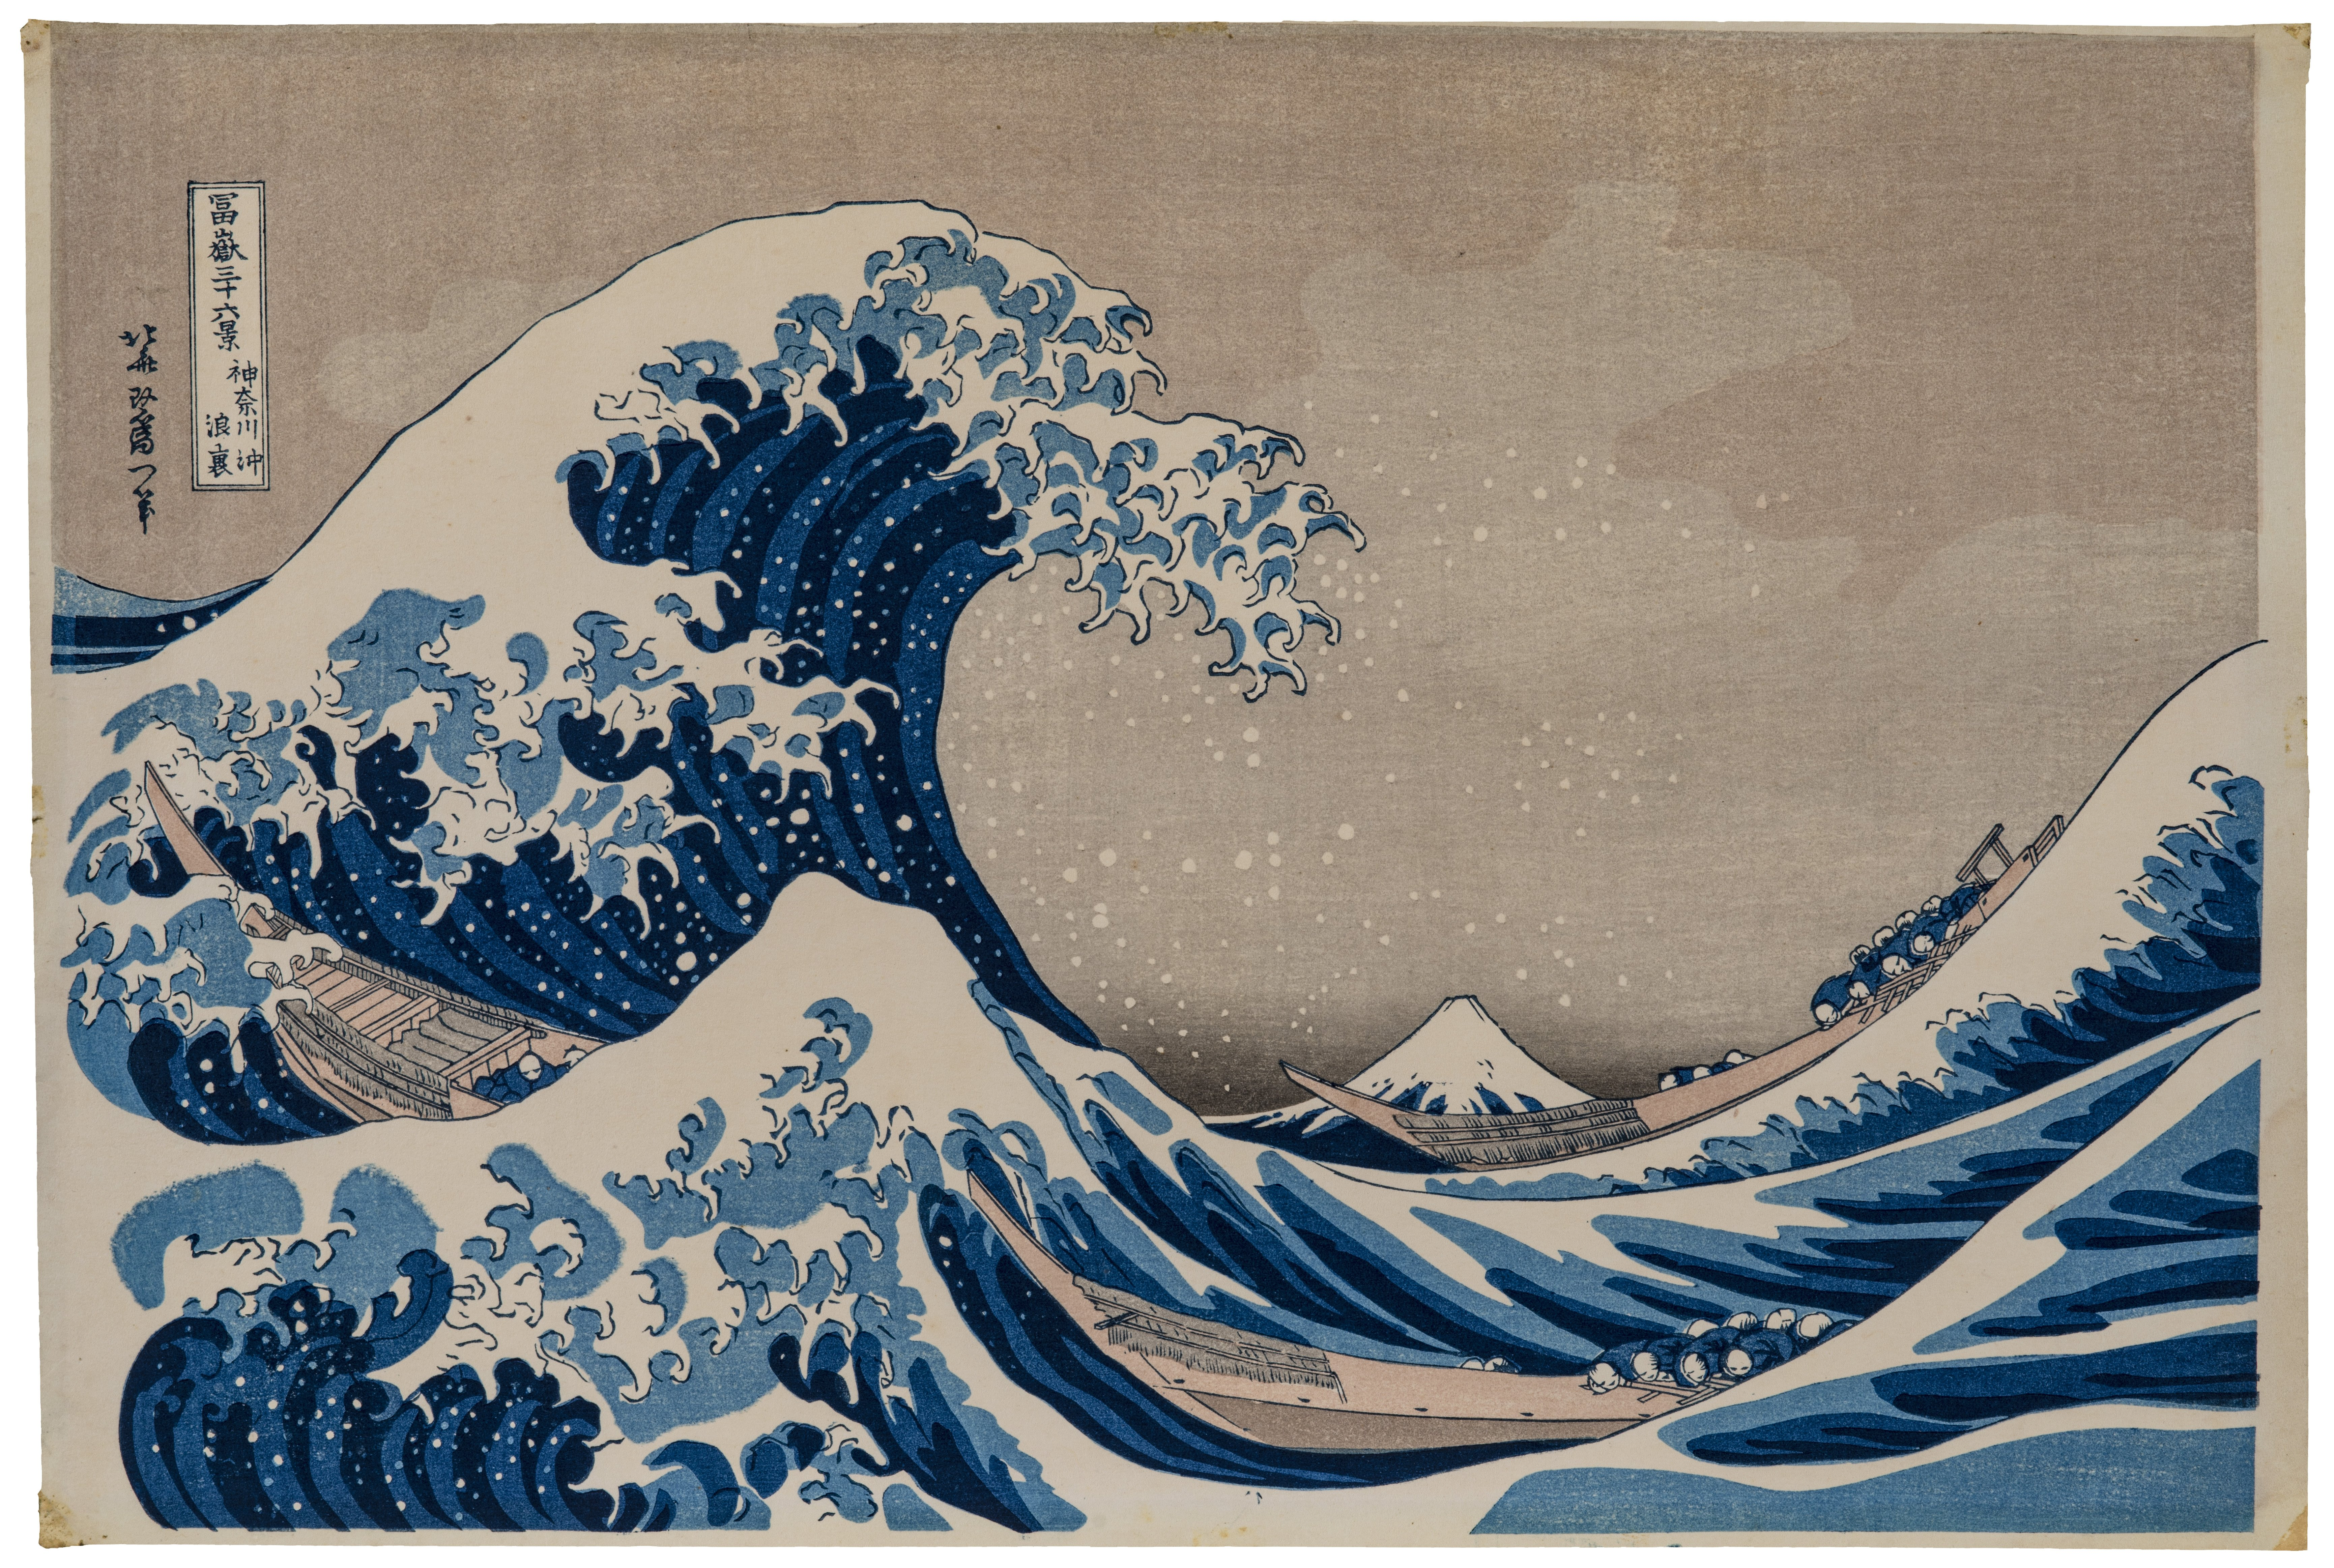 An Antique Japanese Woodblock Print Great Wave Off Kanazawa By Katsushika Hokusai (1760-1849)